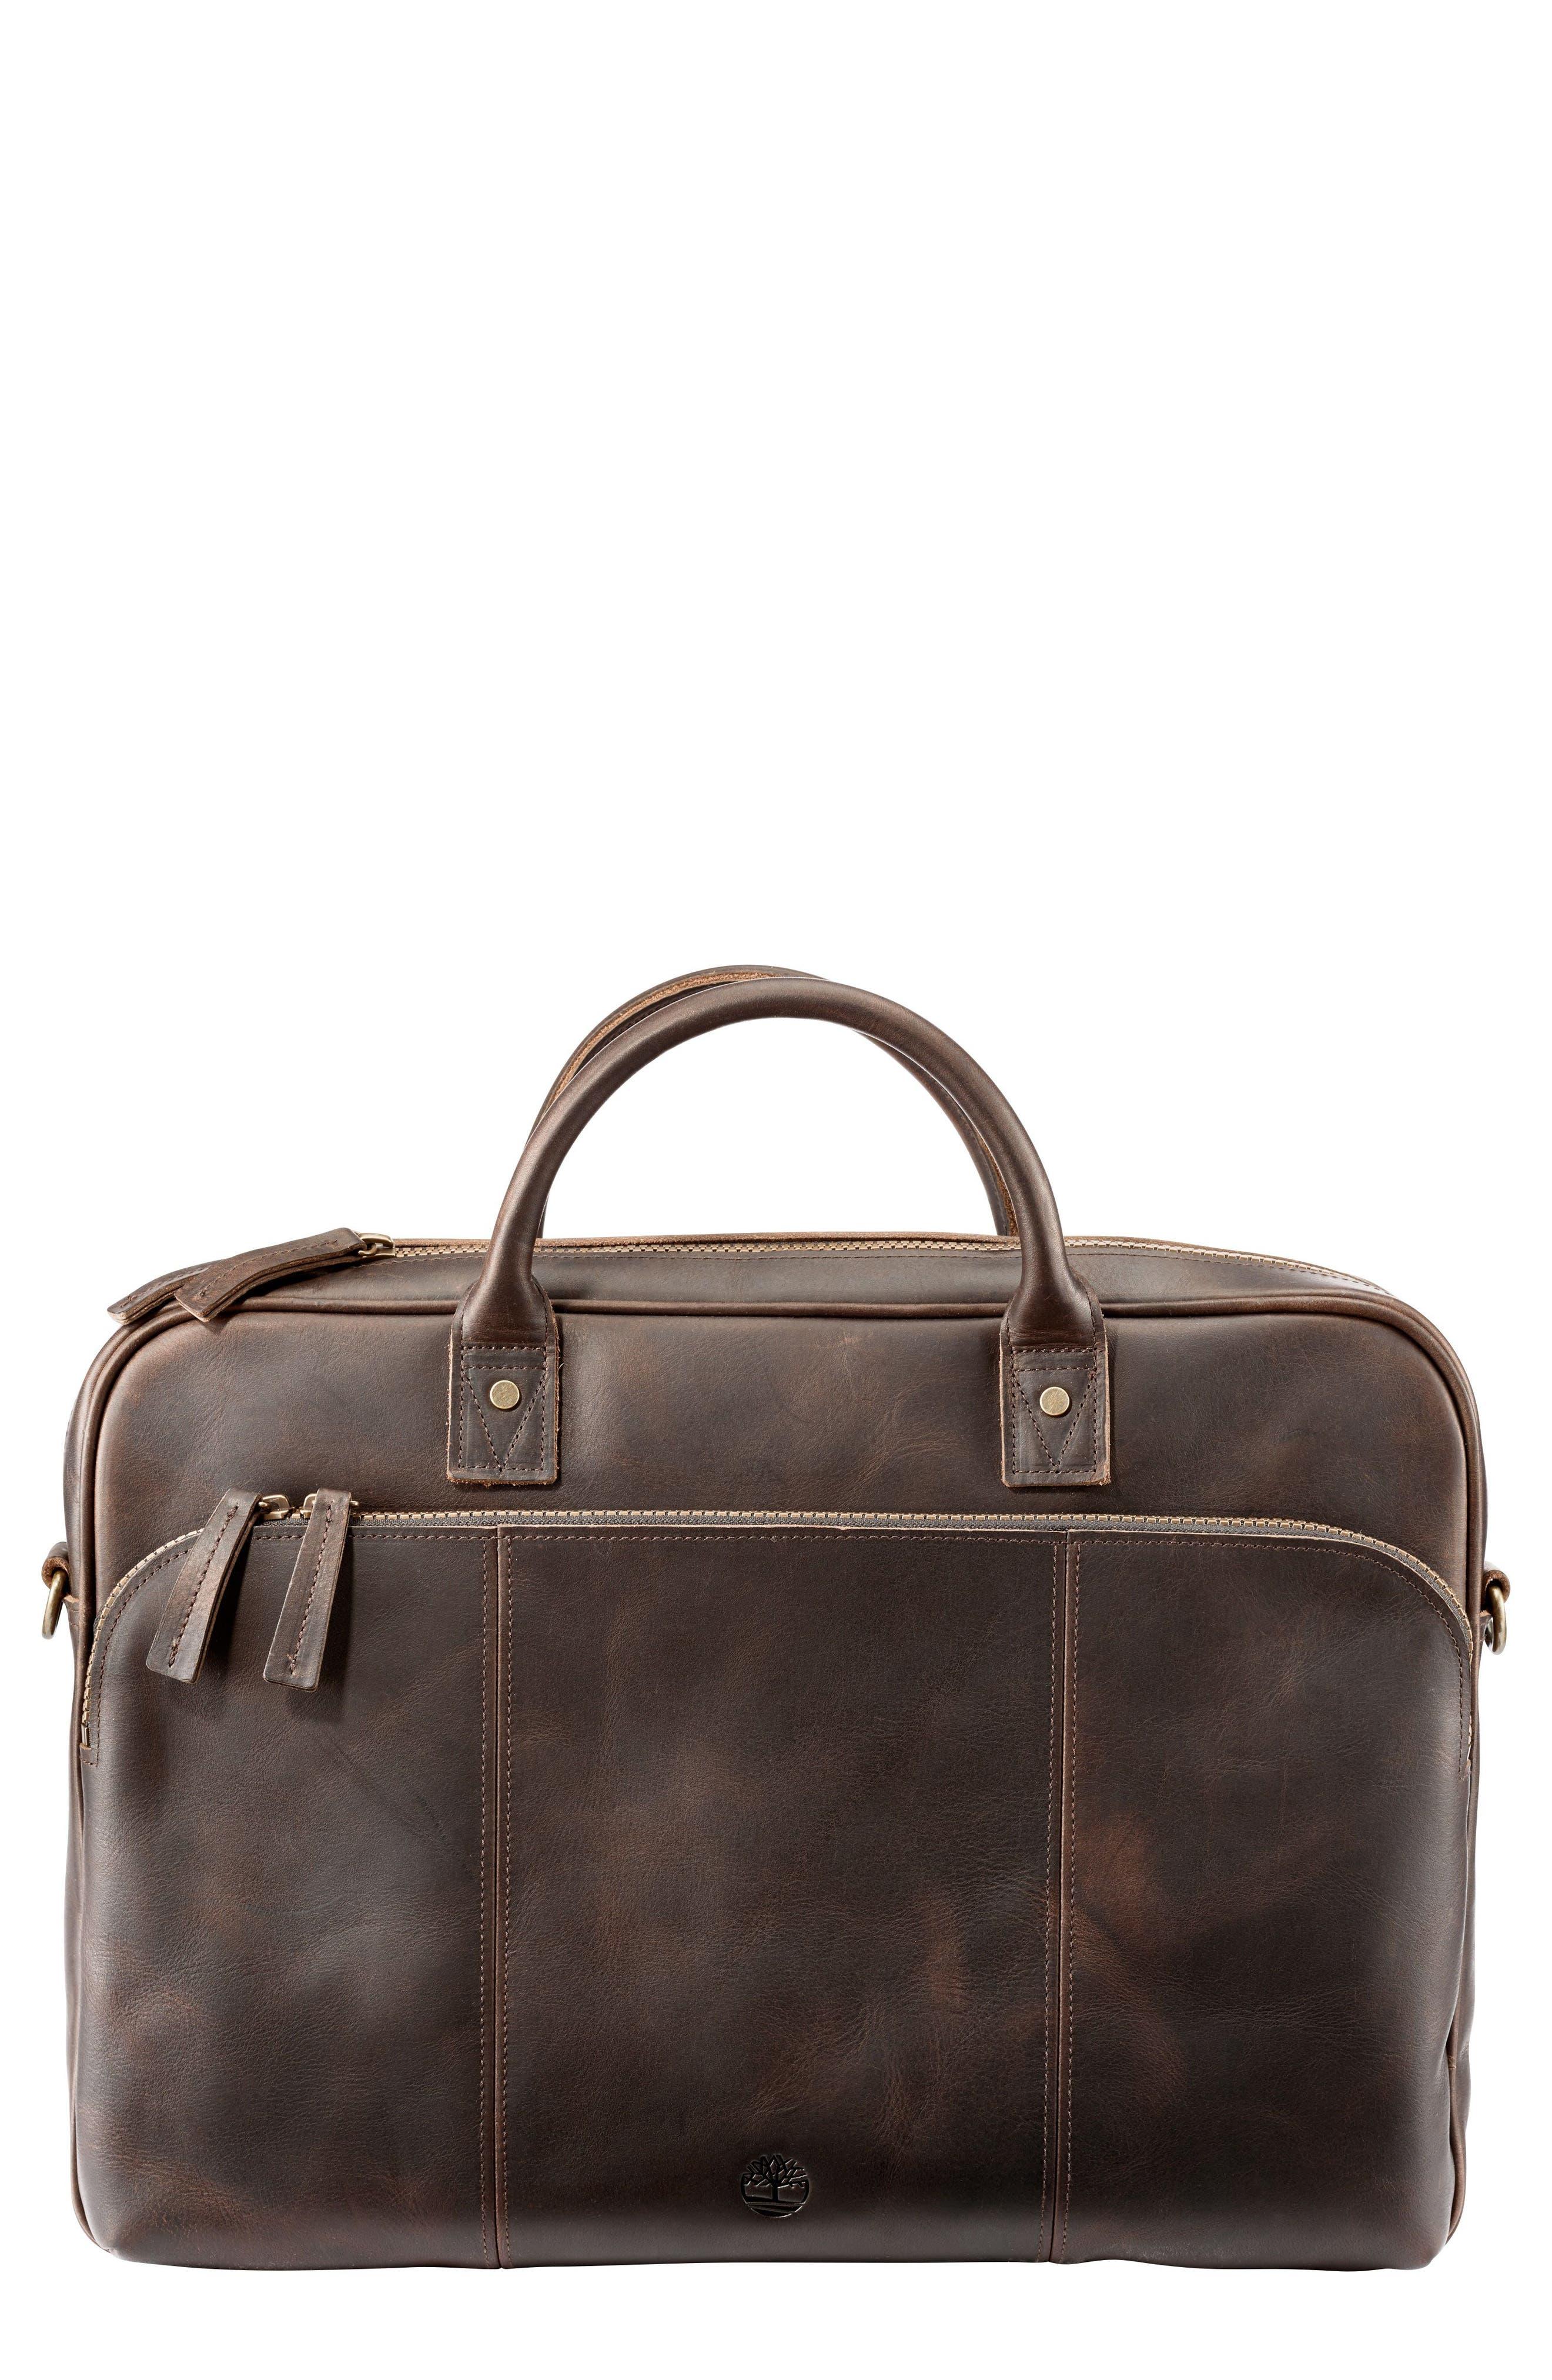 Timberland Tuckerman Leather Briefcase